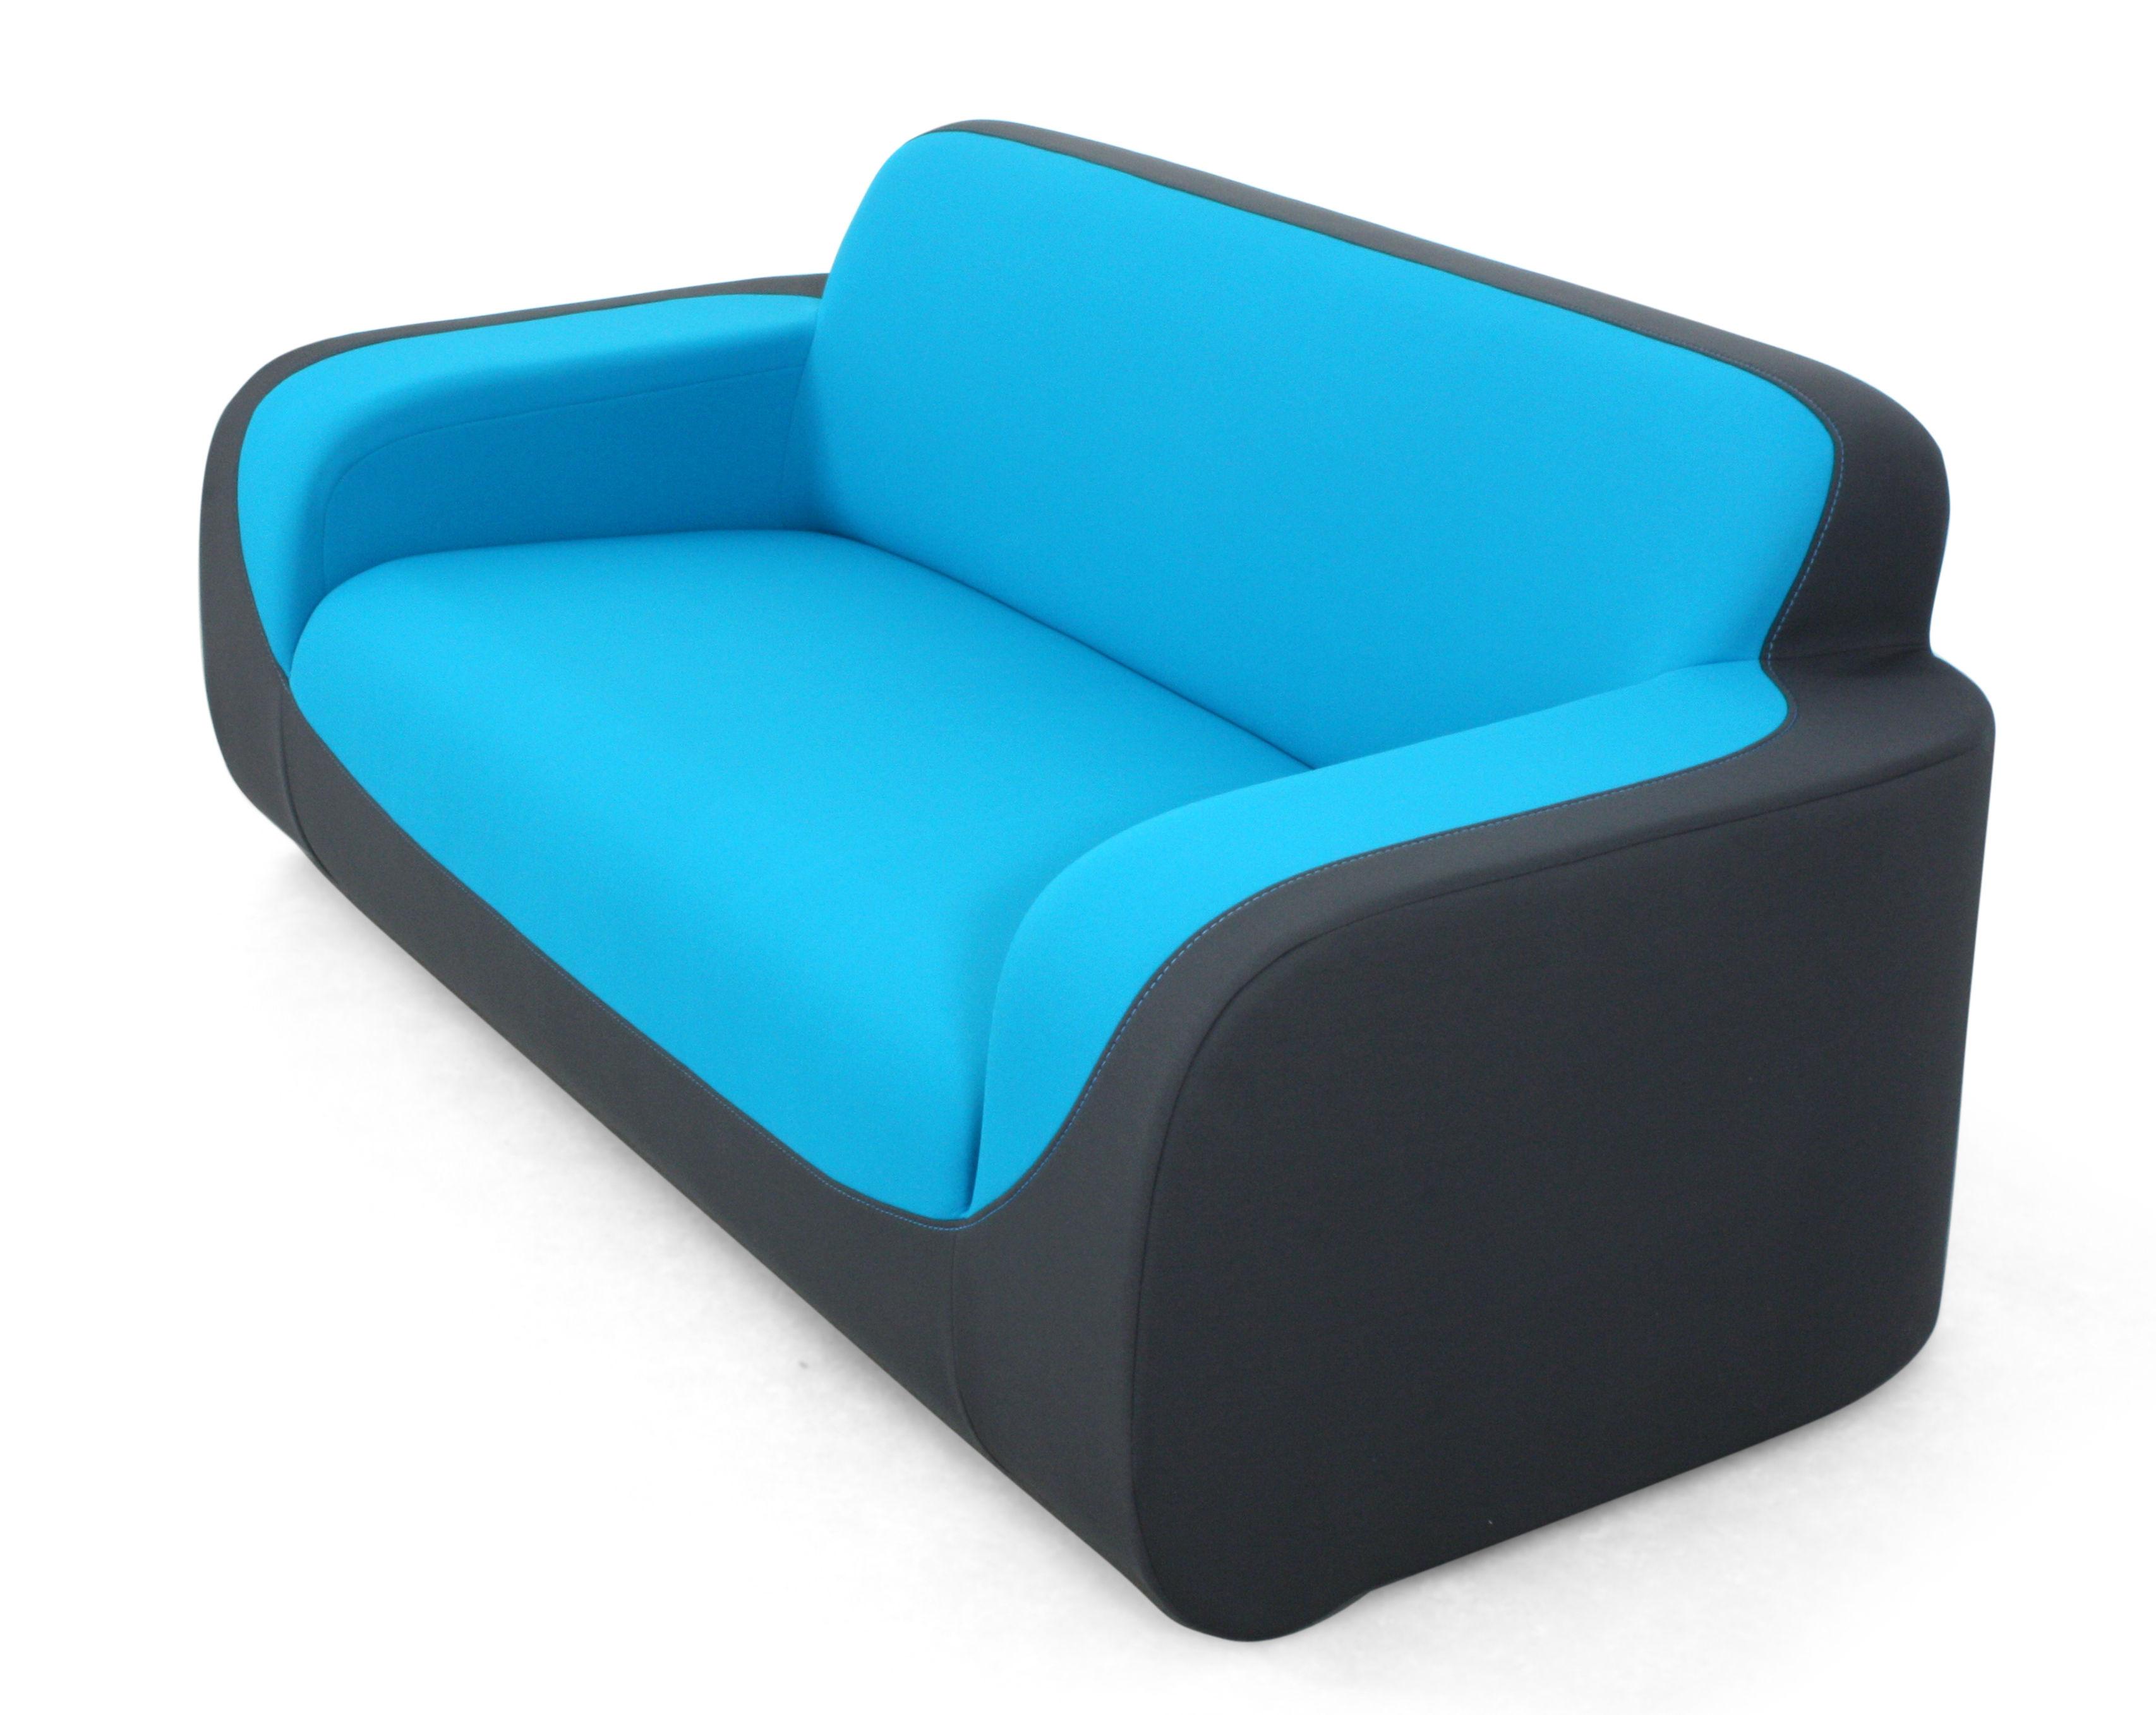 curling by ora ito sofa 2 sitzer l 180 cm grau blau deko naht t rkis by dunlopillo. Black Bedroom Furniture Sets. Home Design Ideas